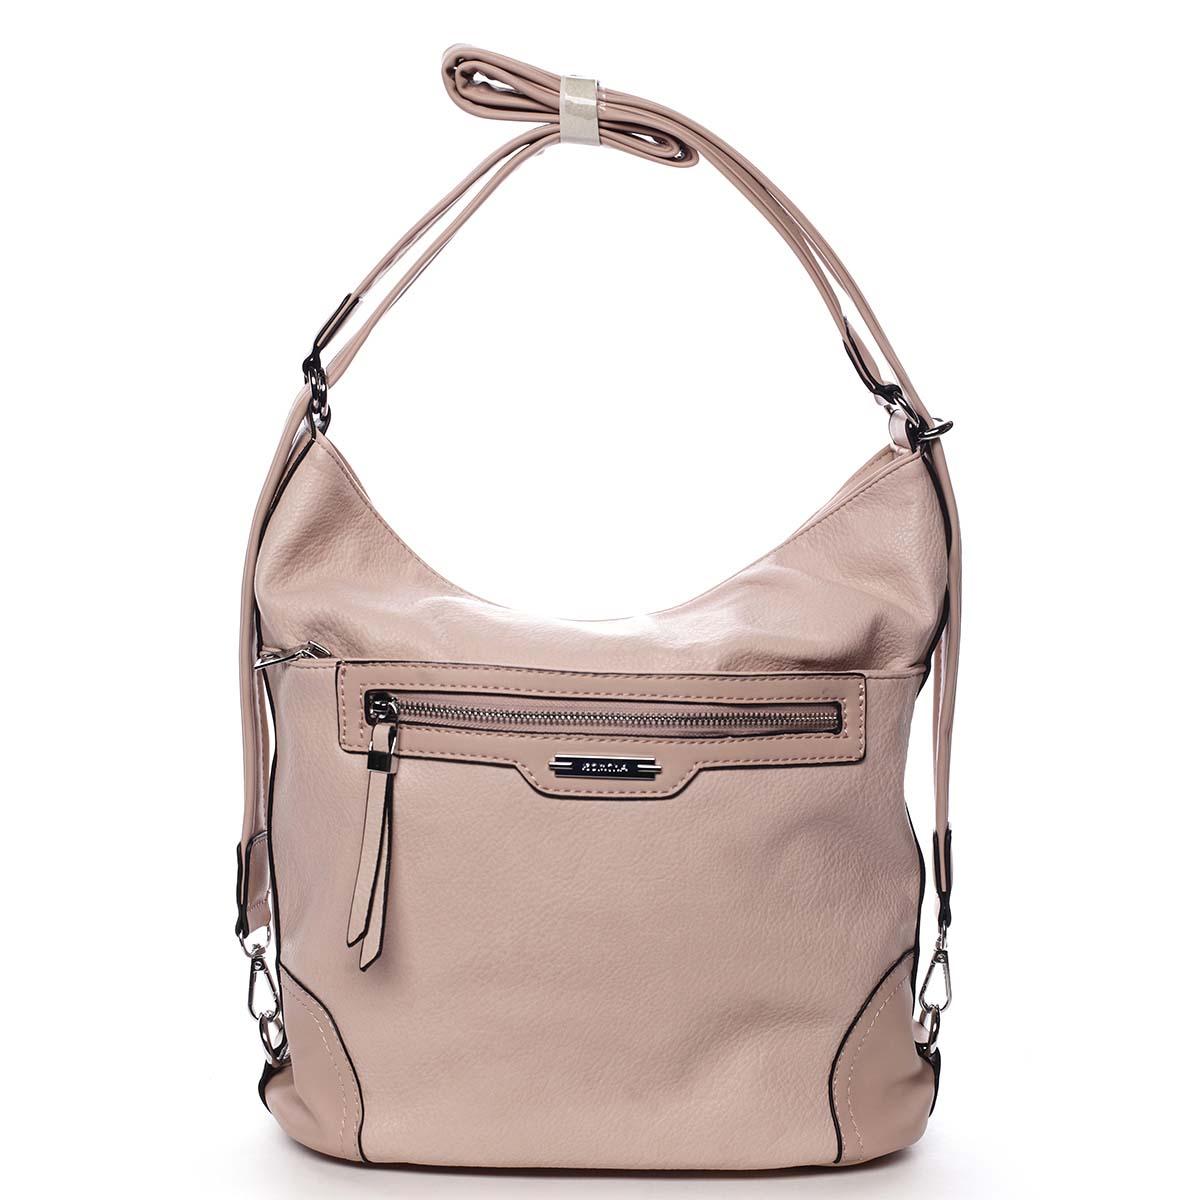 Dámska kabelka batoh ružová - Romina Zilla